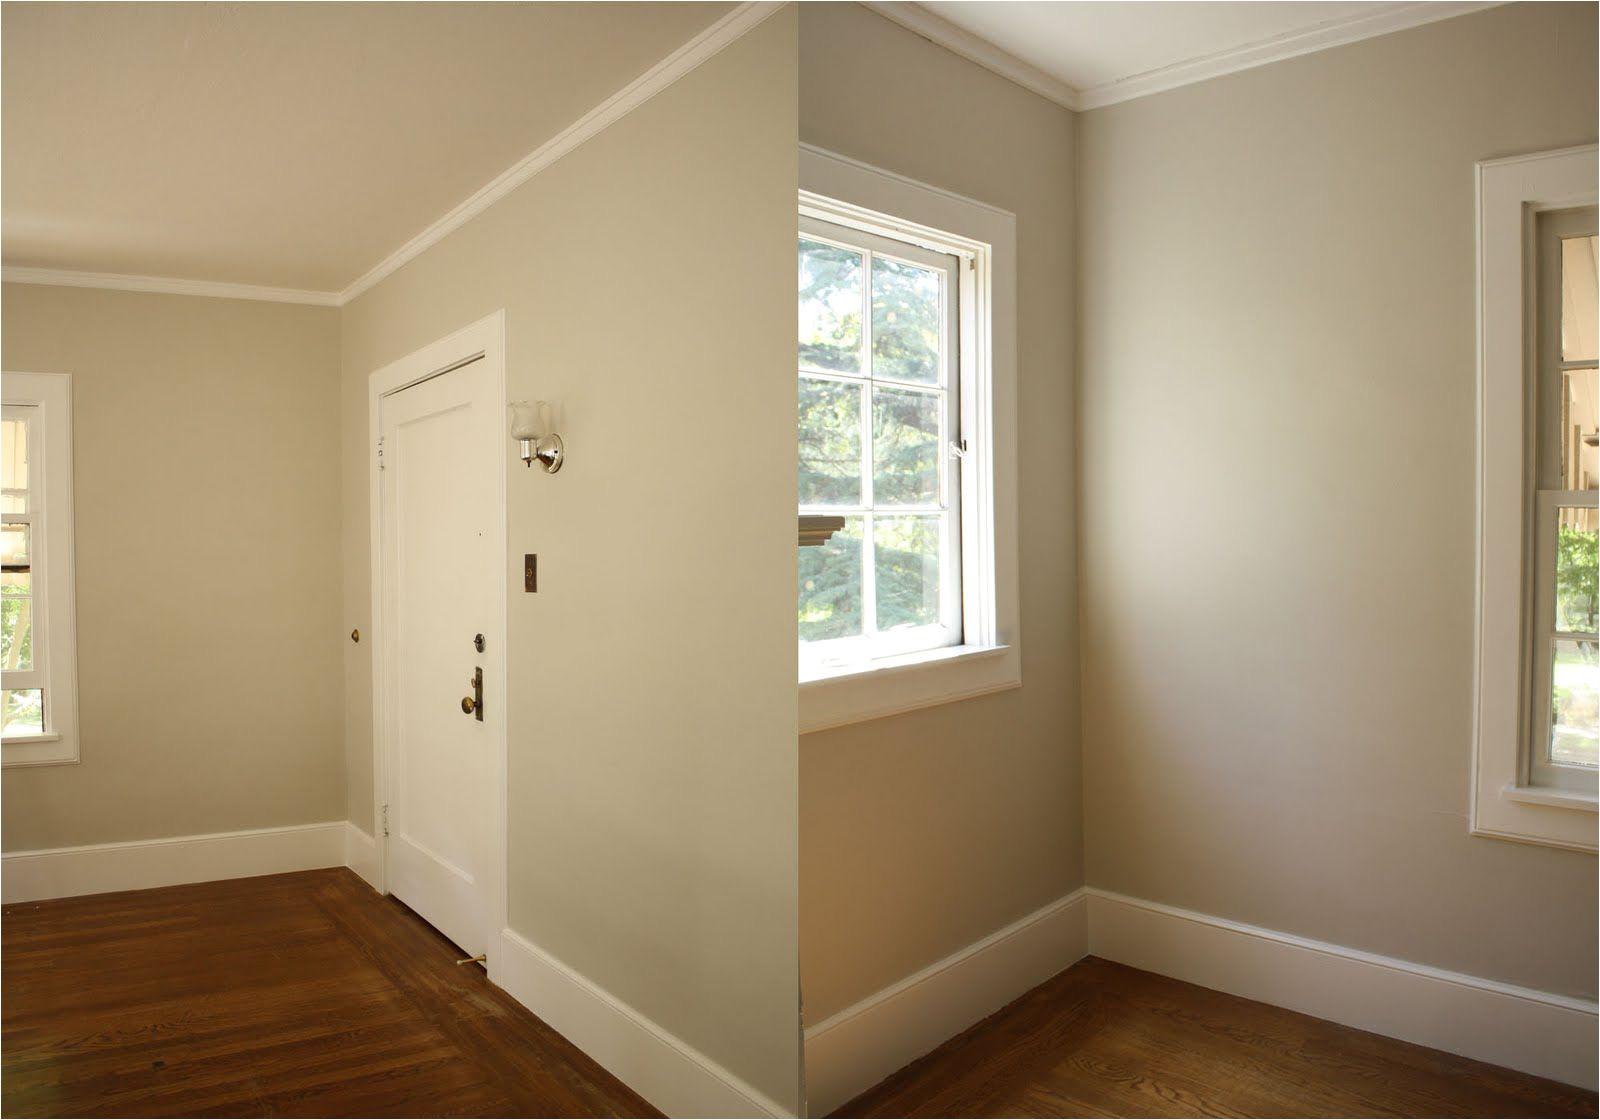 benjamin moore edgecomb gray hc 173 for living room kitchen